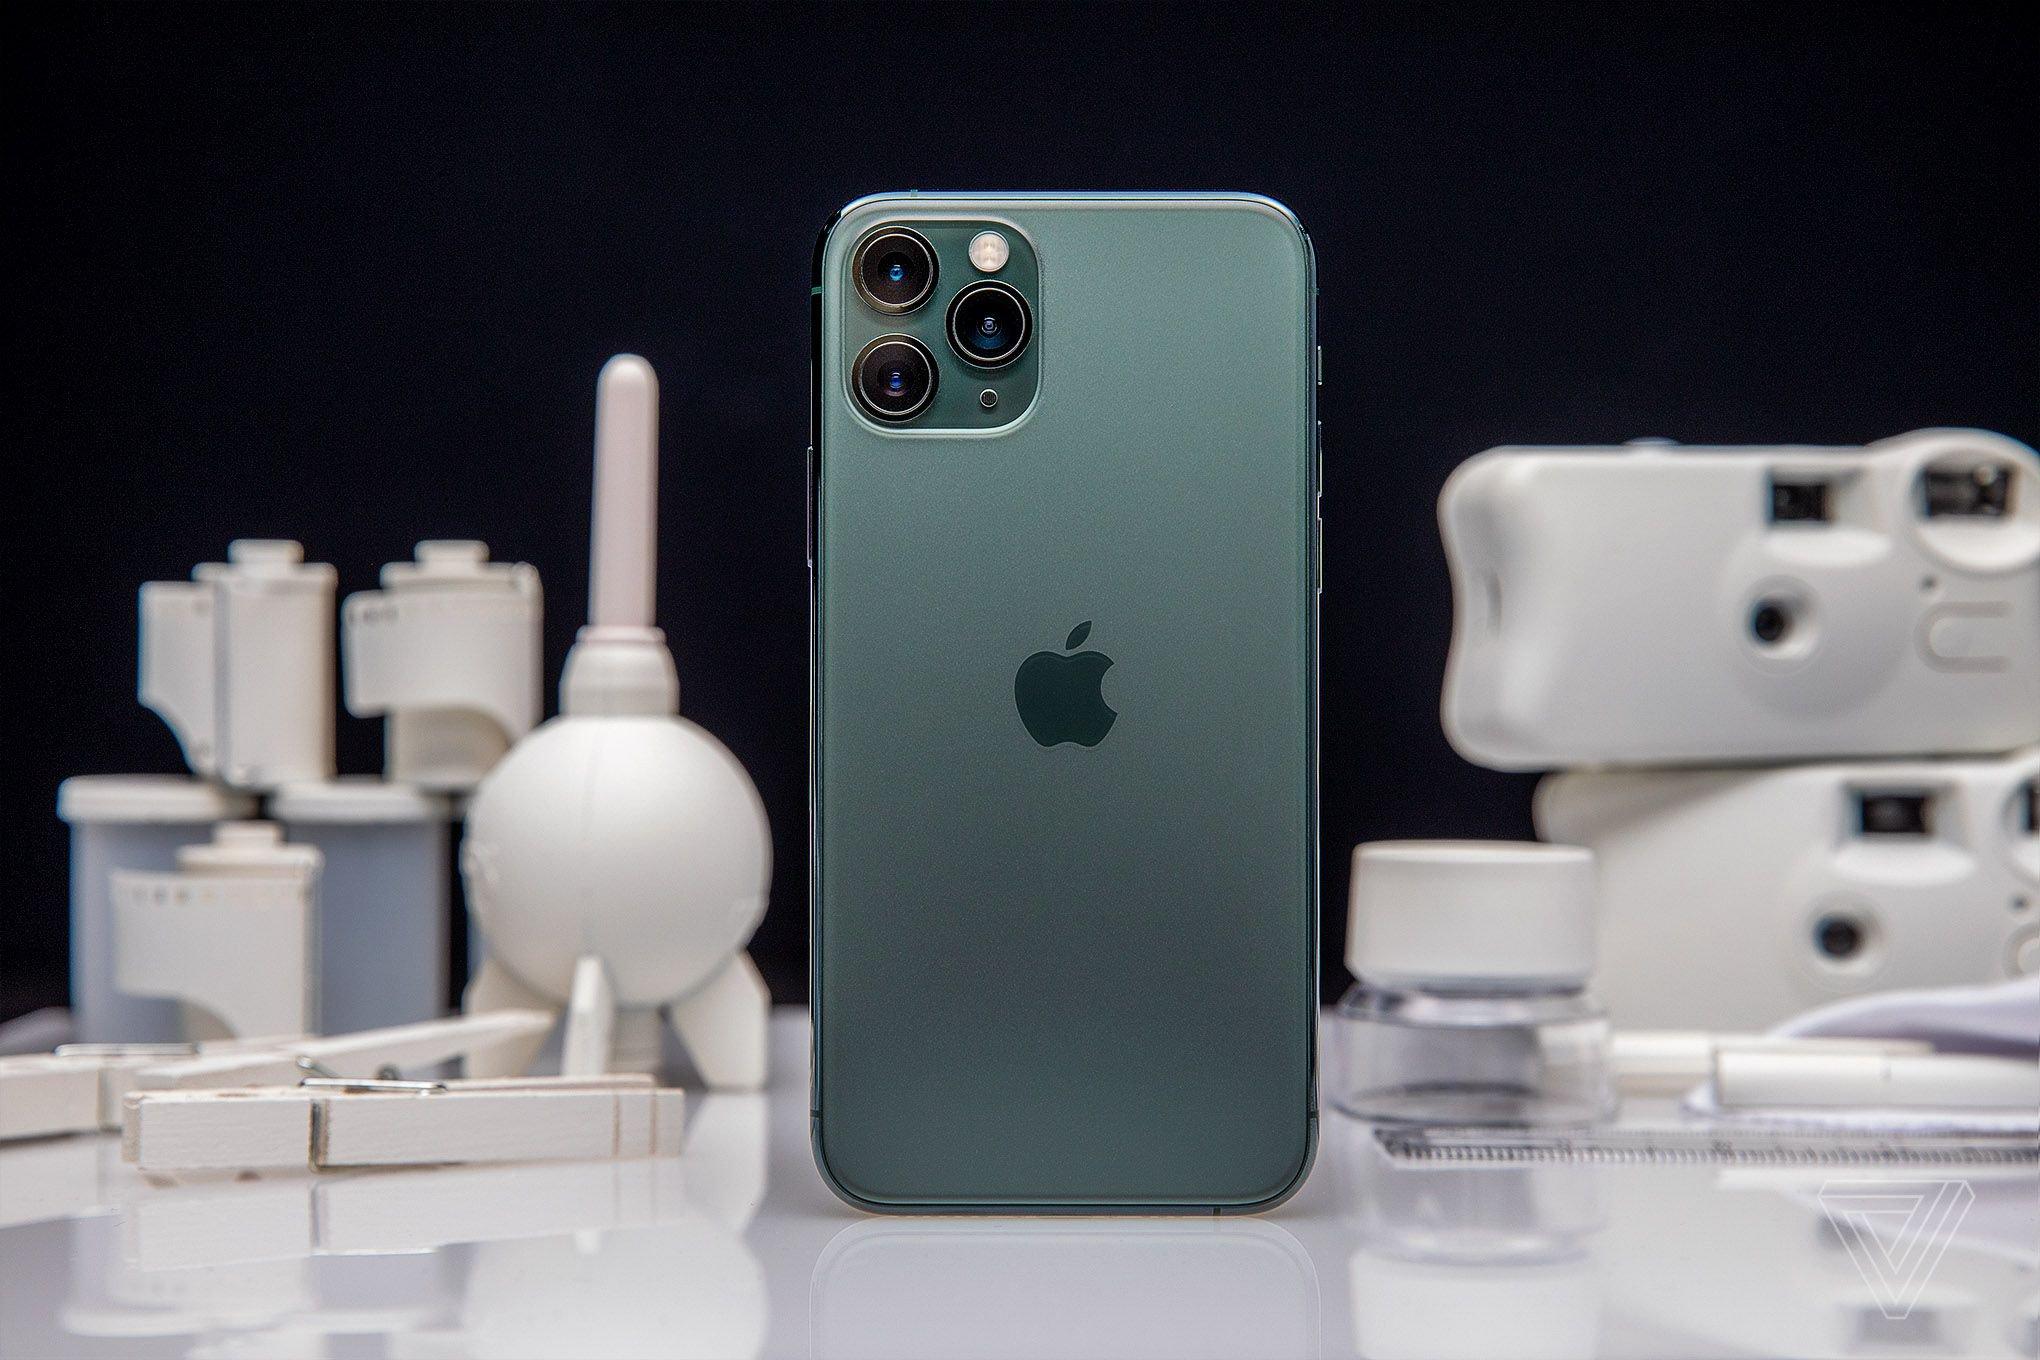 айфон 11 про 64 темно-зеленый